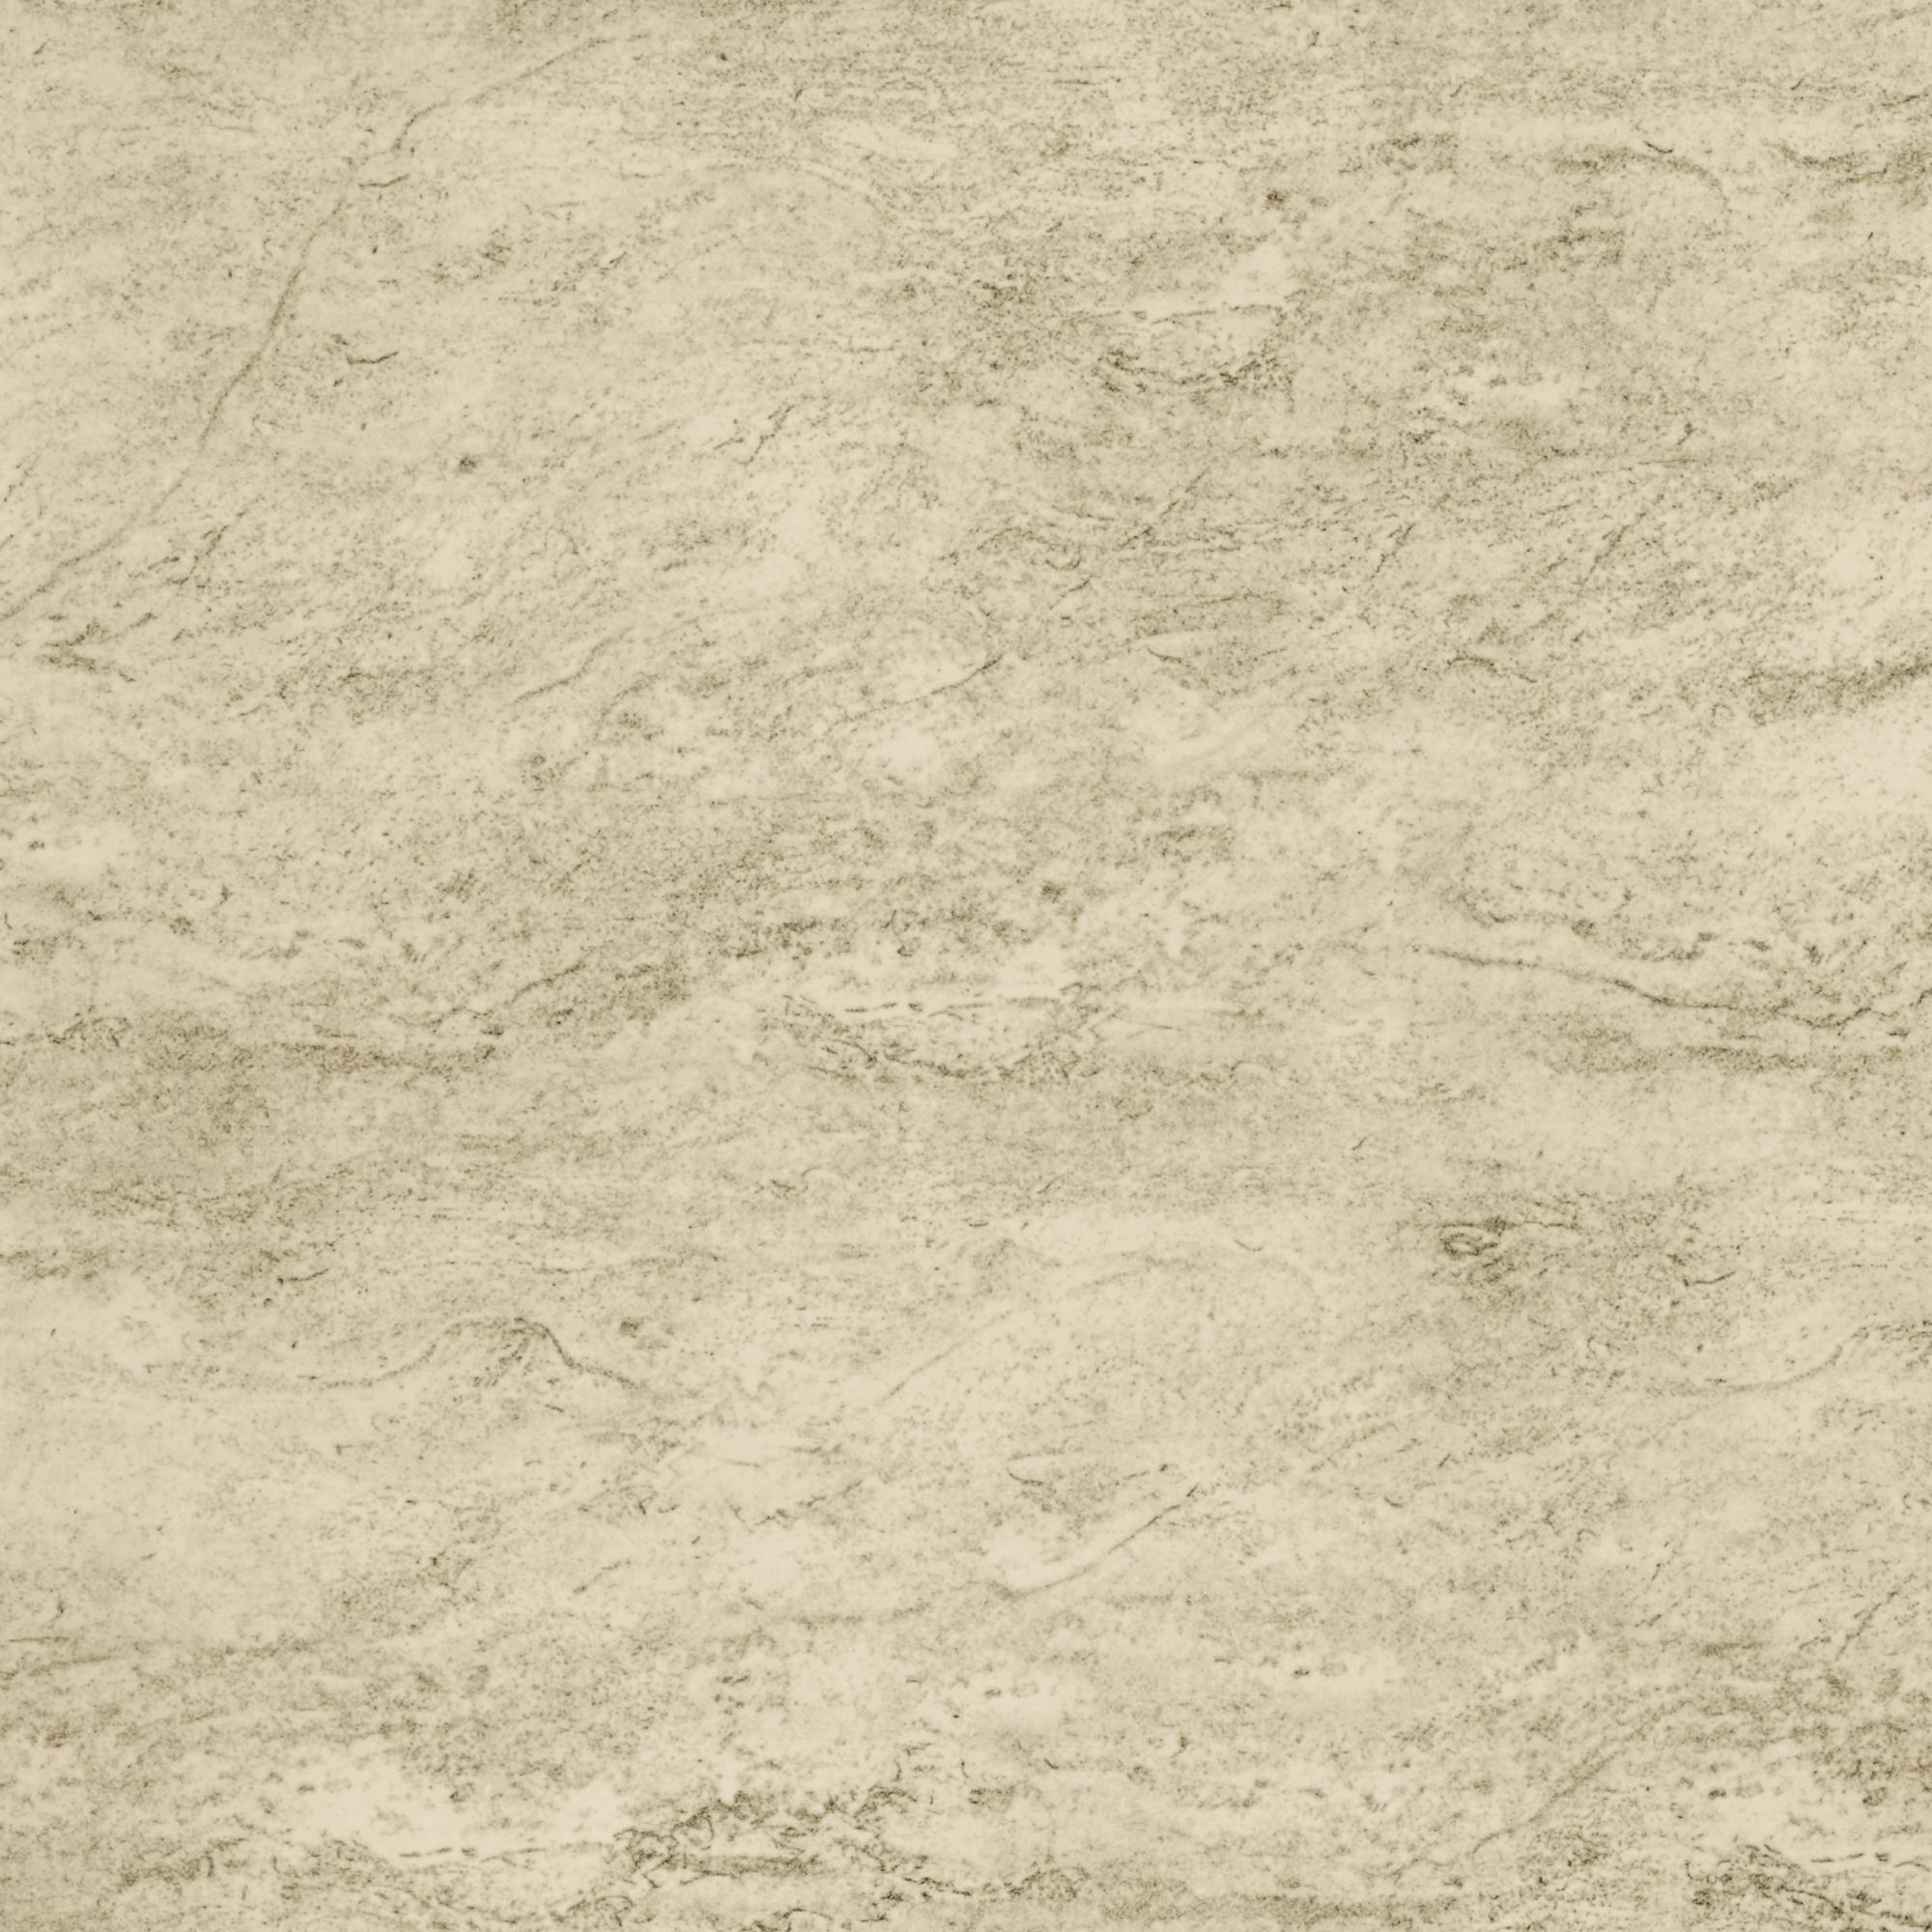 Gresie de interior  KAI PROGRES CERAMICA - Poza 1